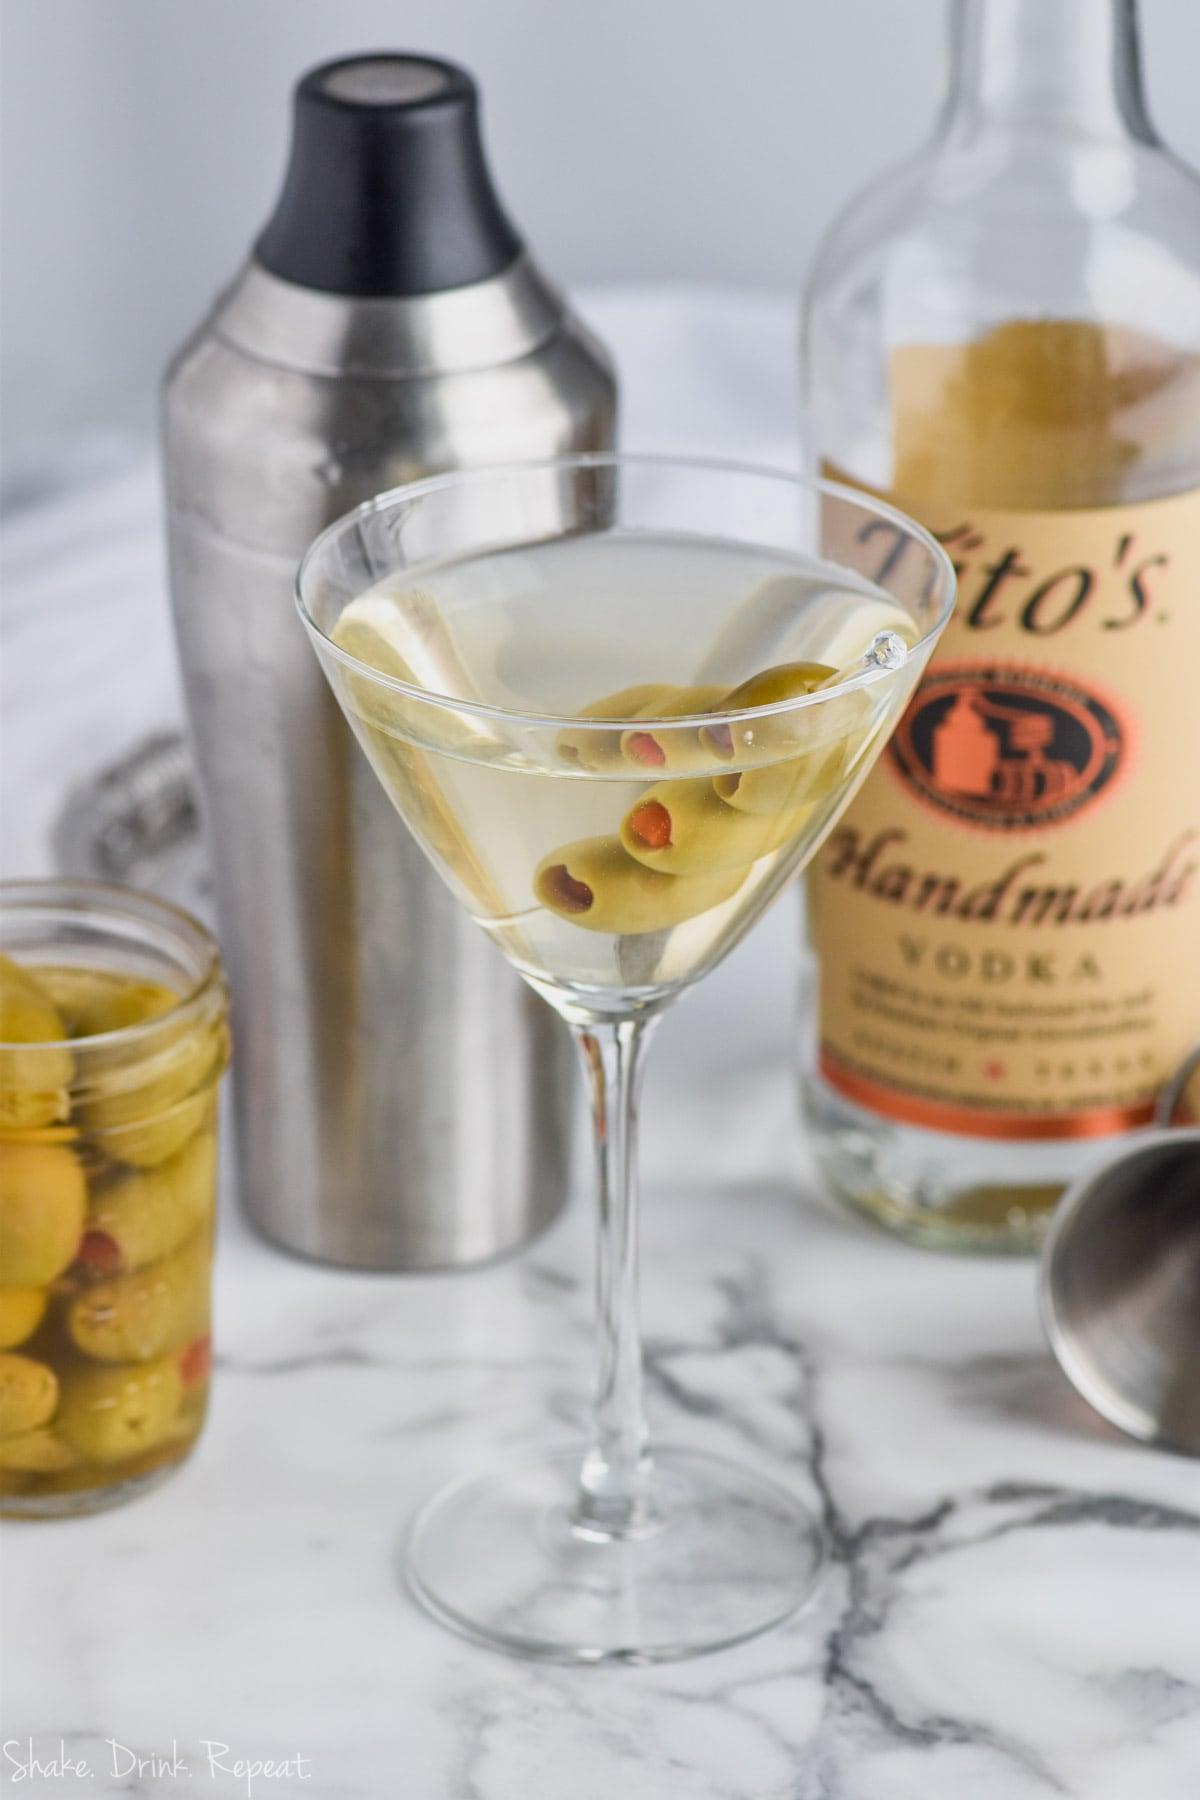 dirty_martini_image-6 - Shake Drink Repeat